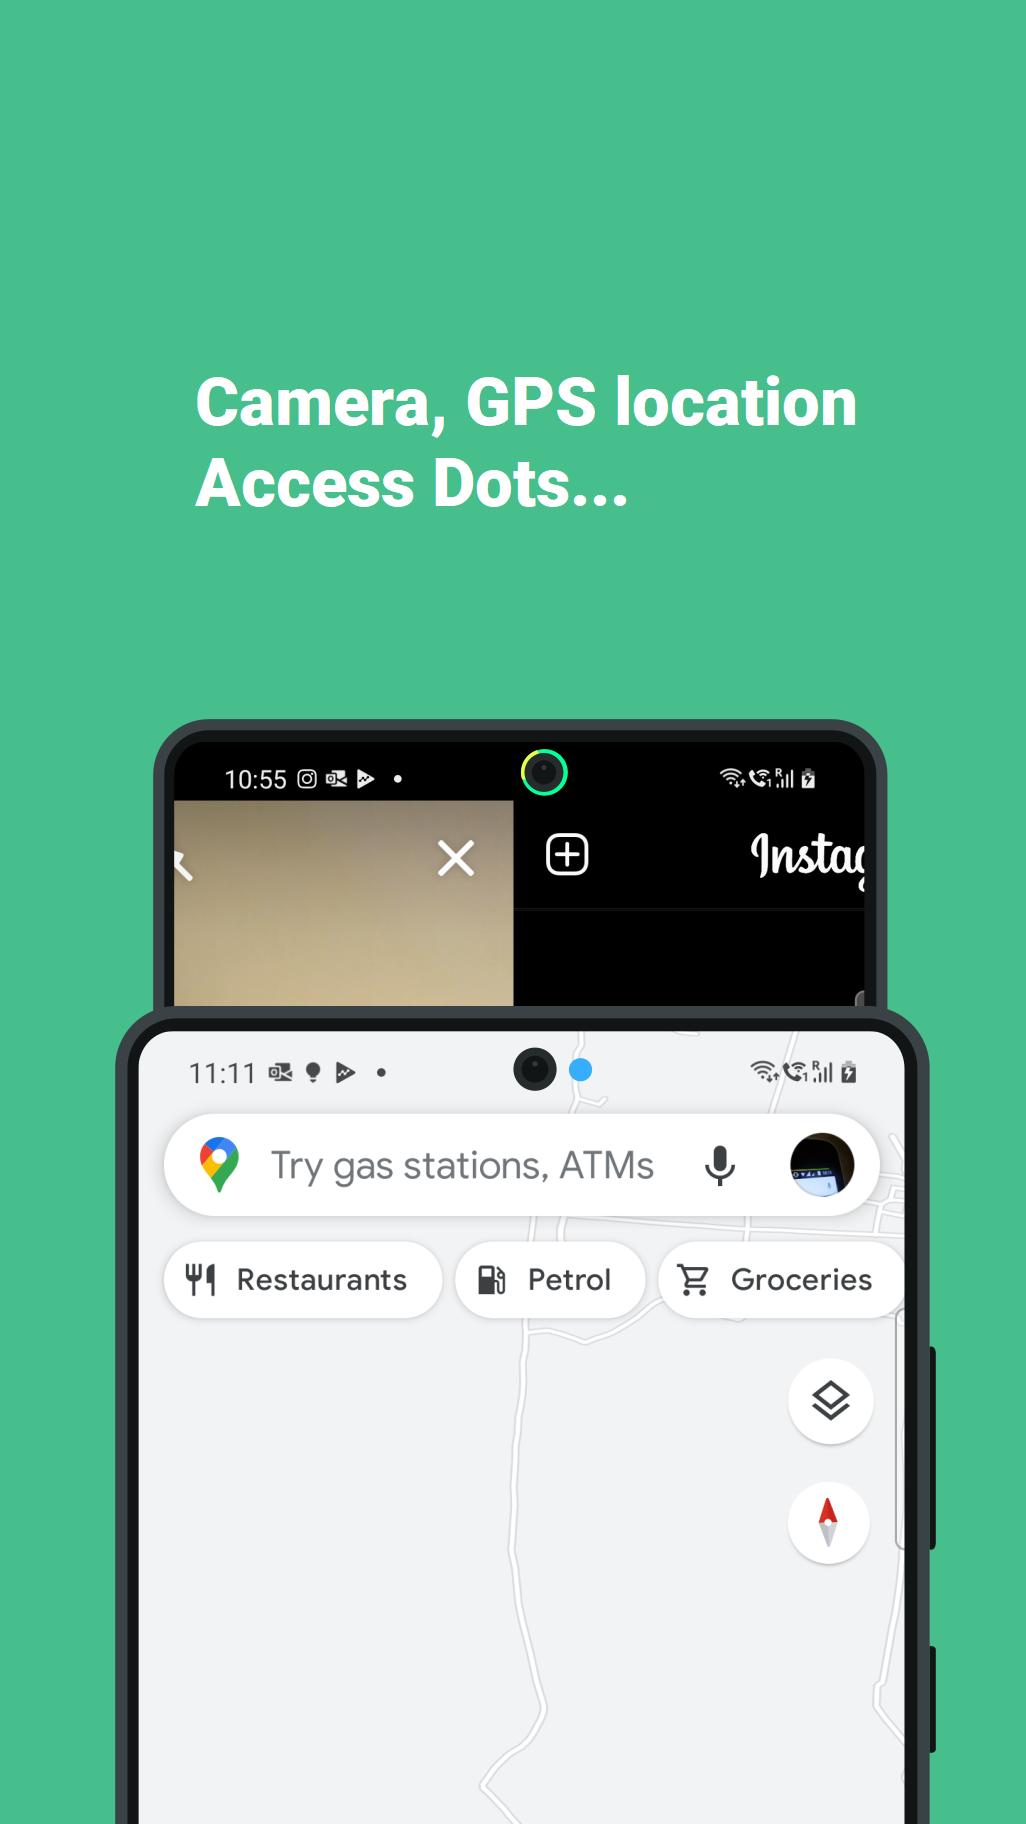 camera gps access dots text.png